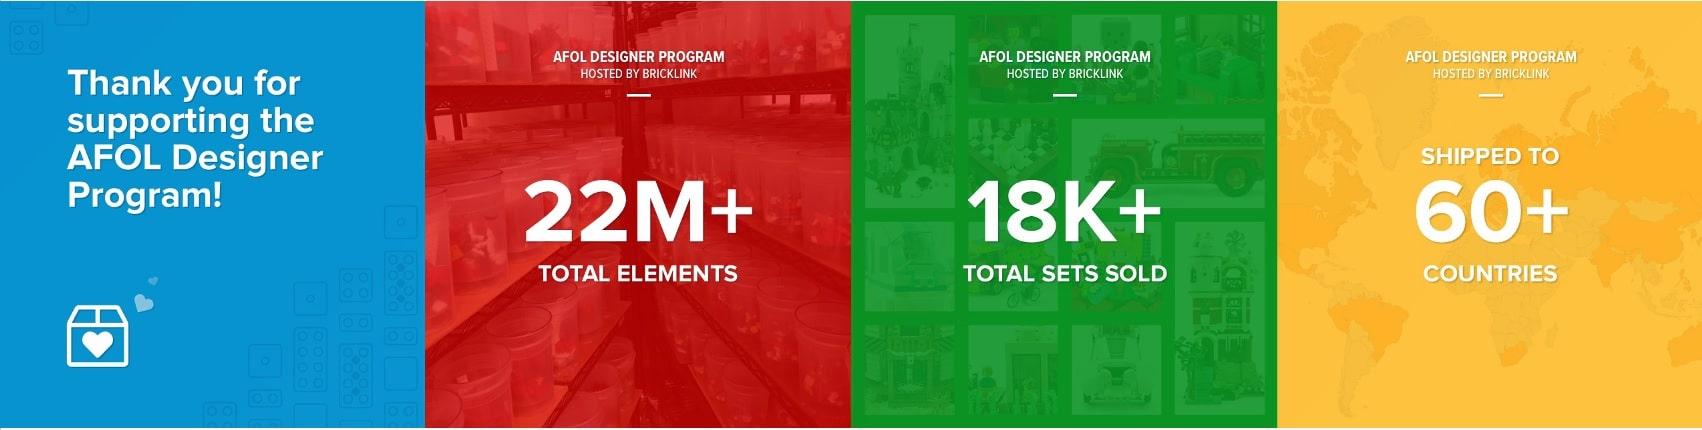 AFOL-Designer-Programm Bricklink